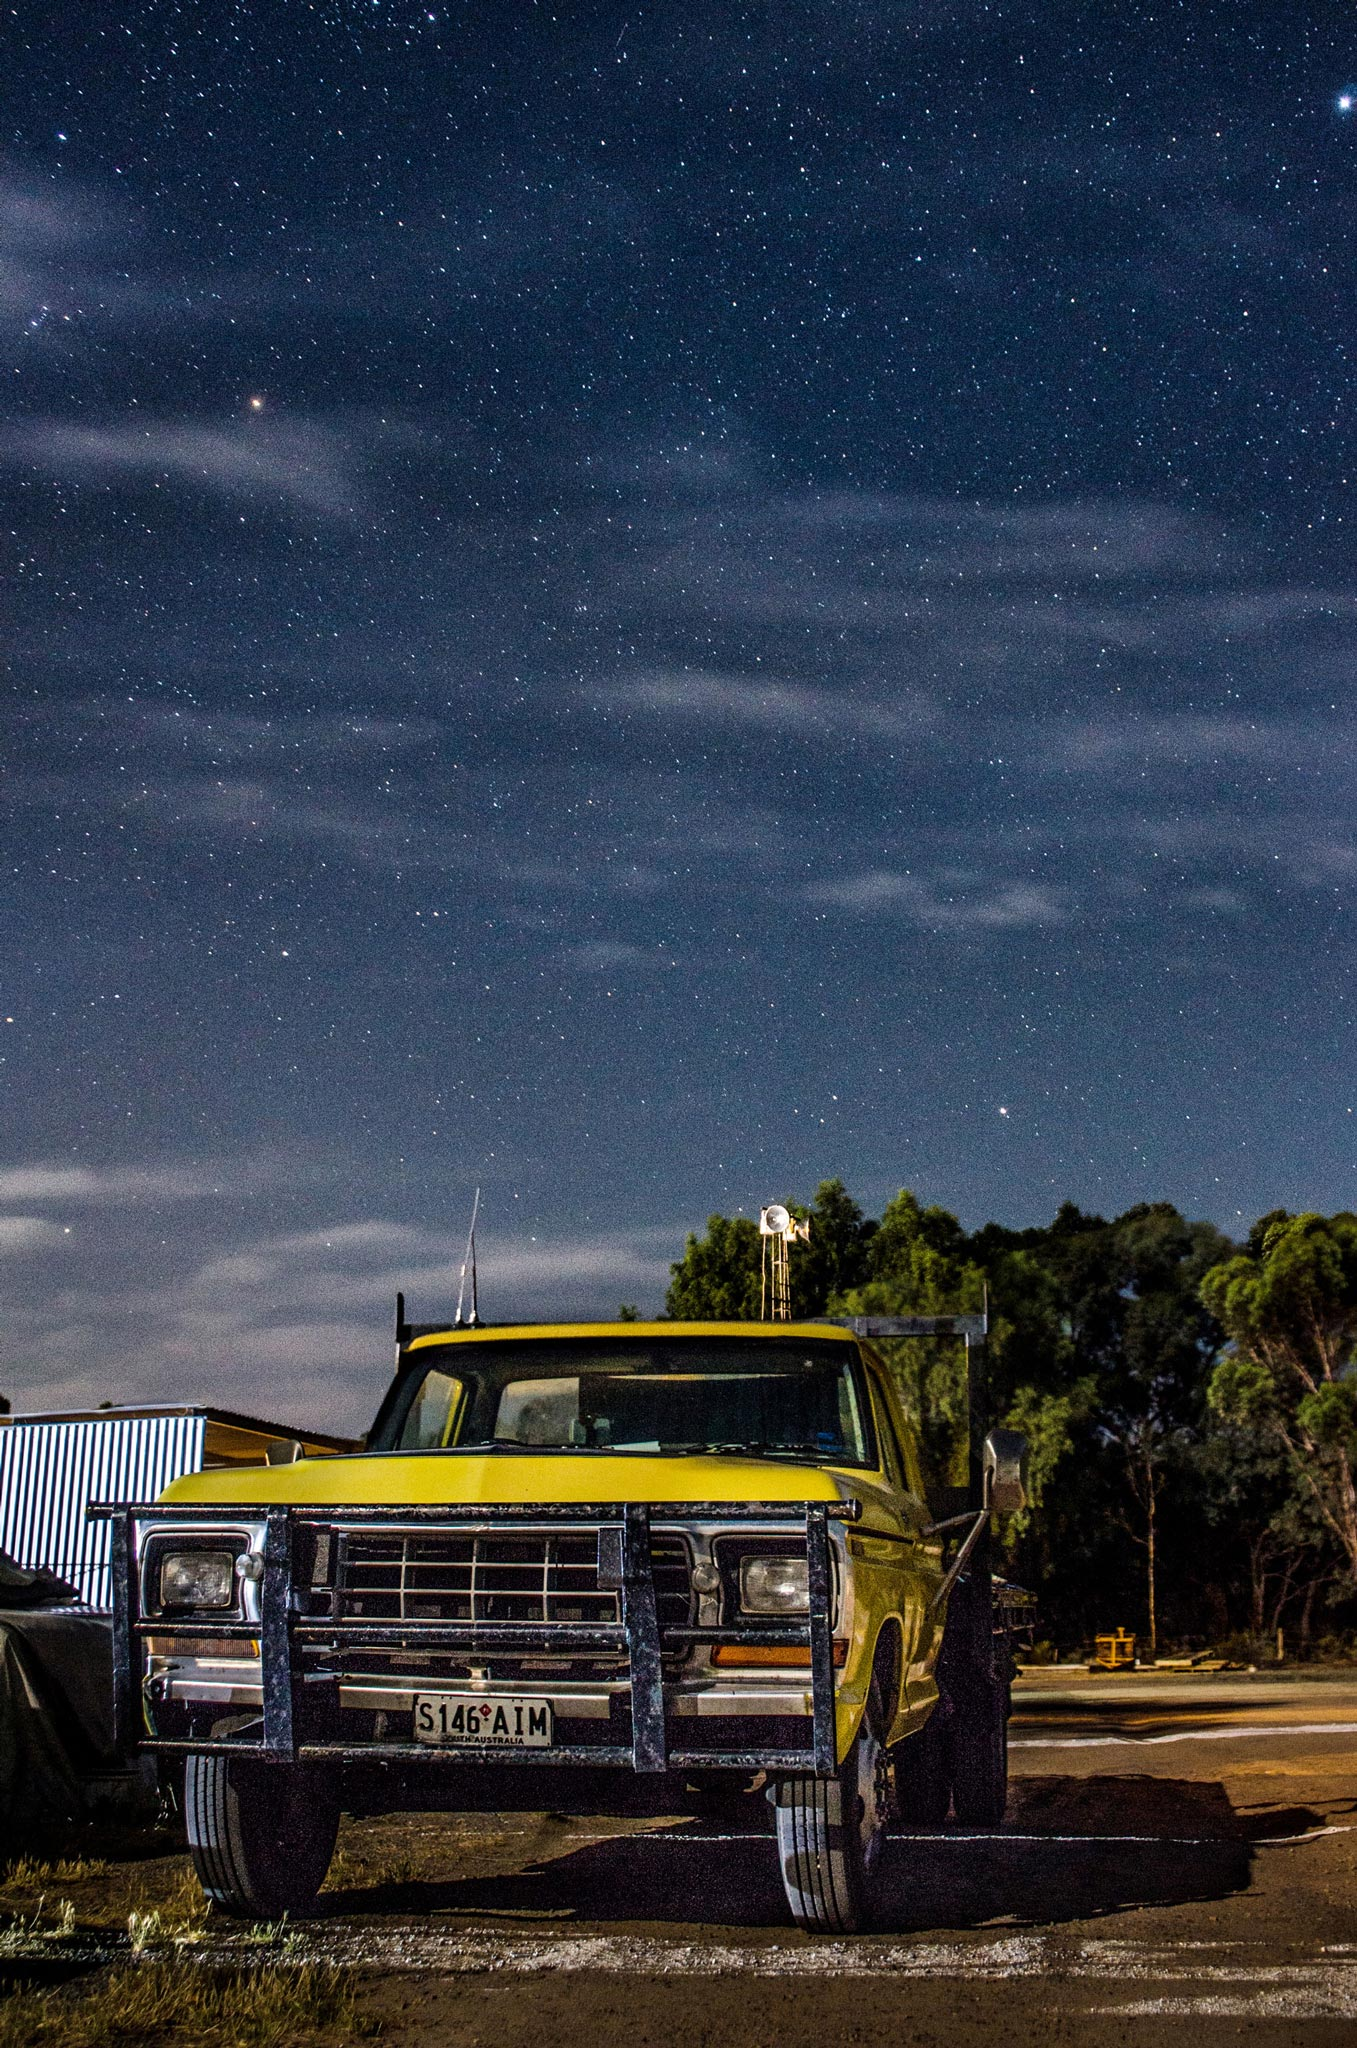 Paesaggi-Australia - Park Paringa - Fotografia-notturna-Australia - Fotografia-notturna-Australia